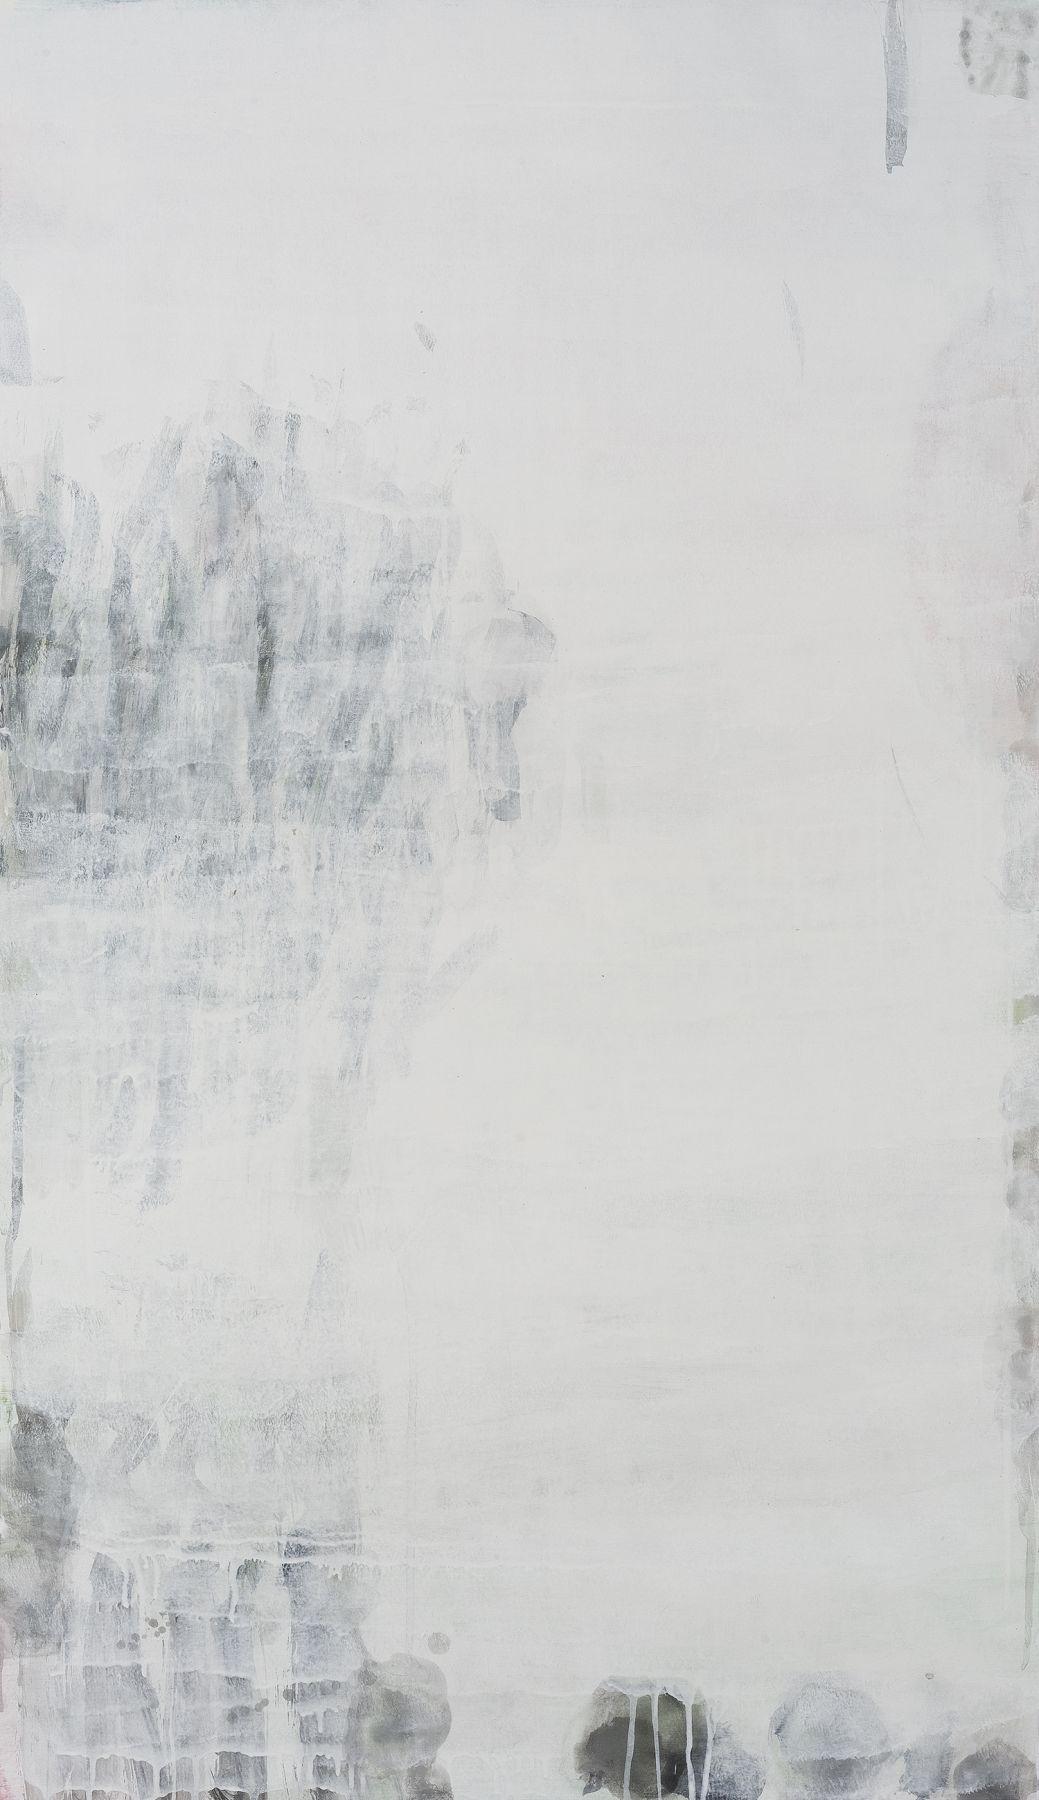 Yan Shanchun 严善錞, Willow Tree #3 柳树 #3